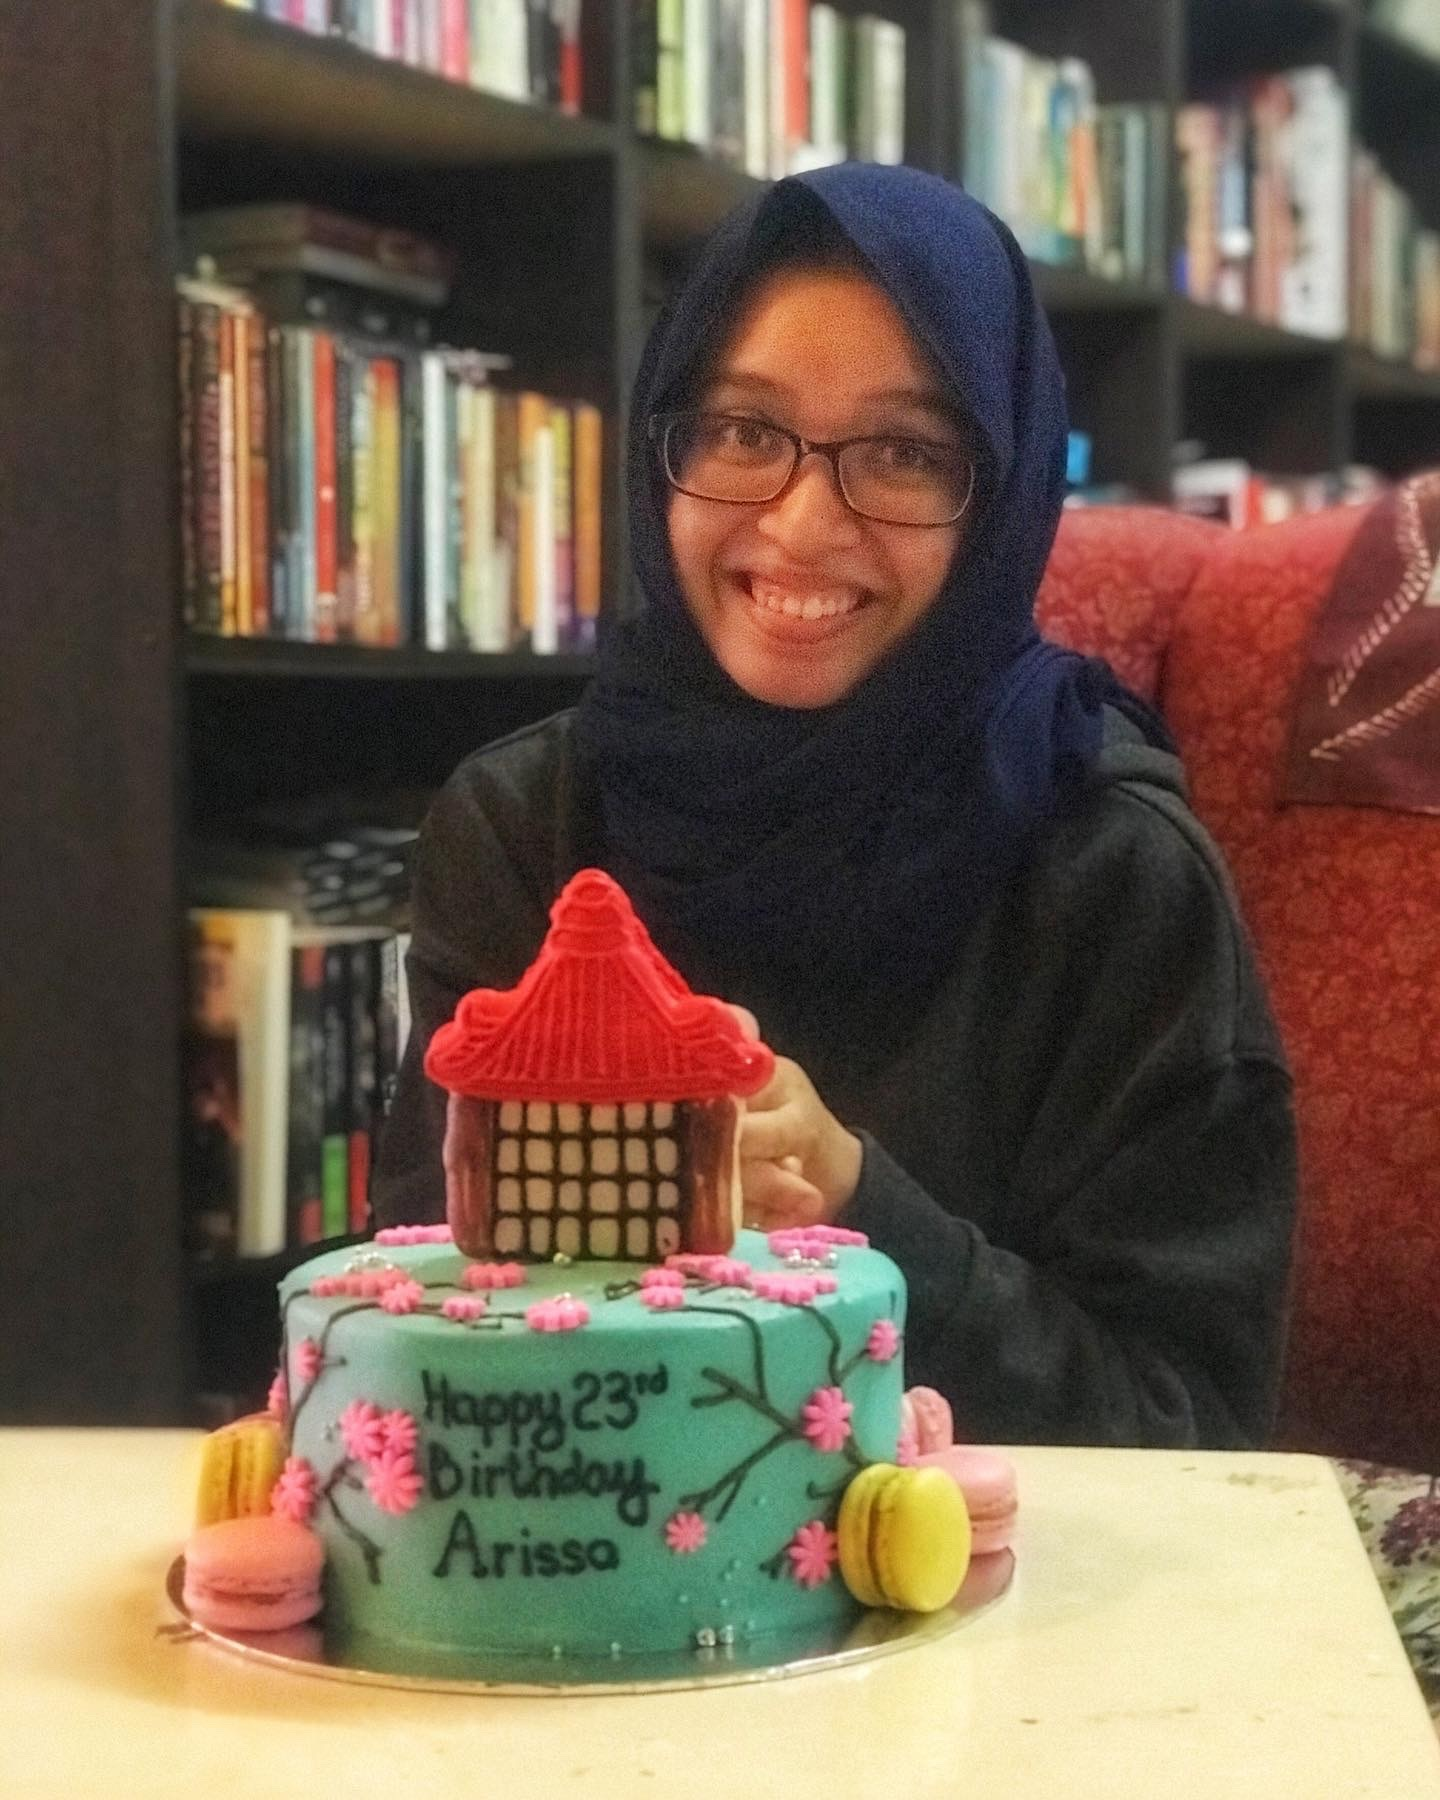 Happy Birthday Arissa